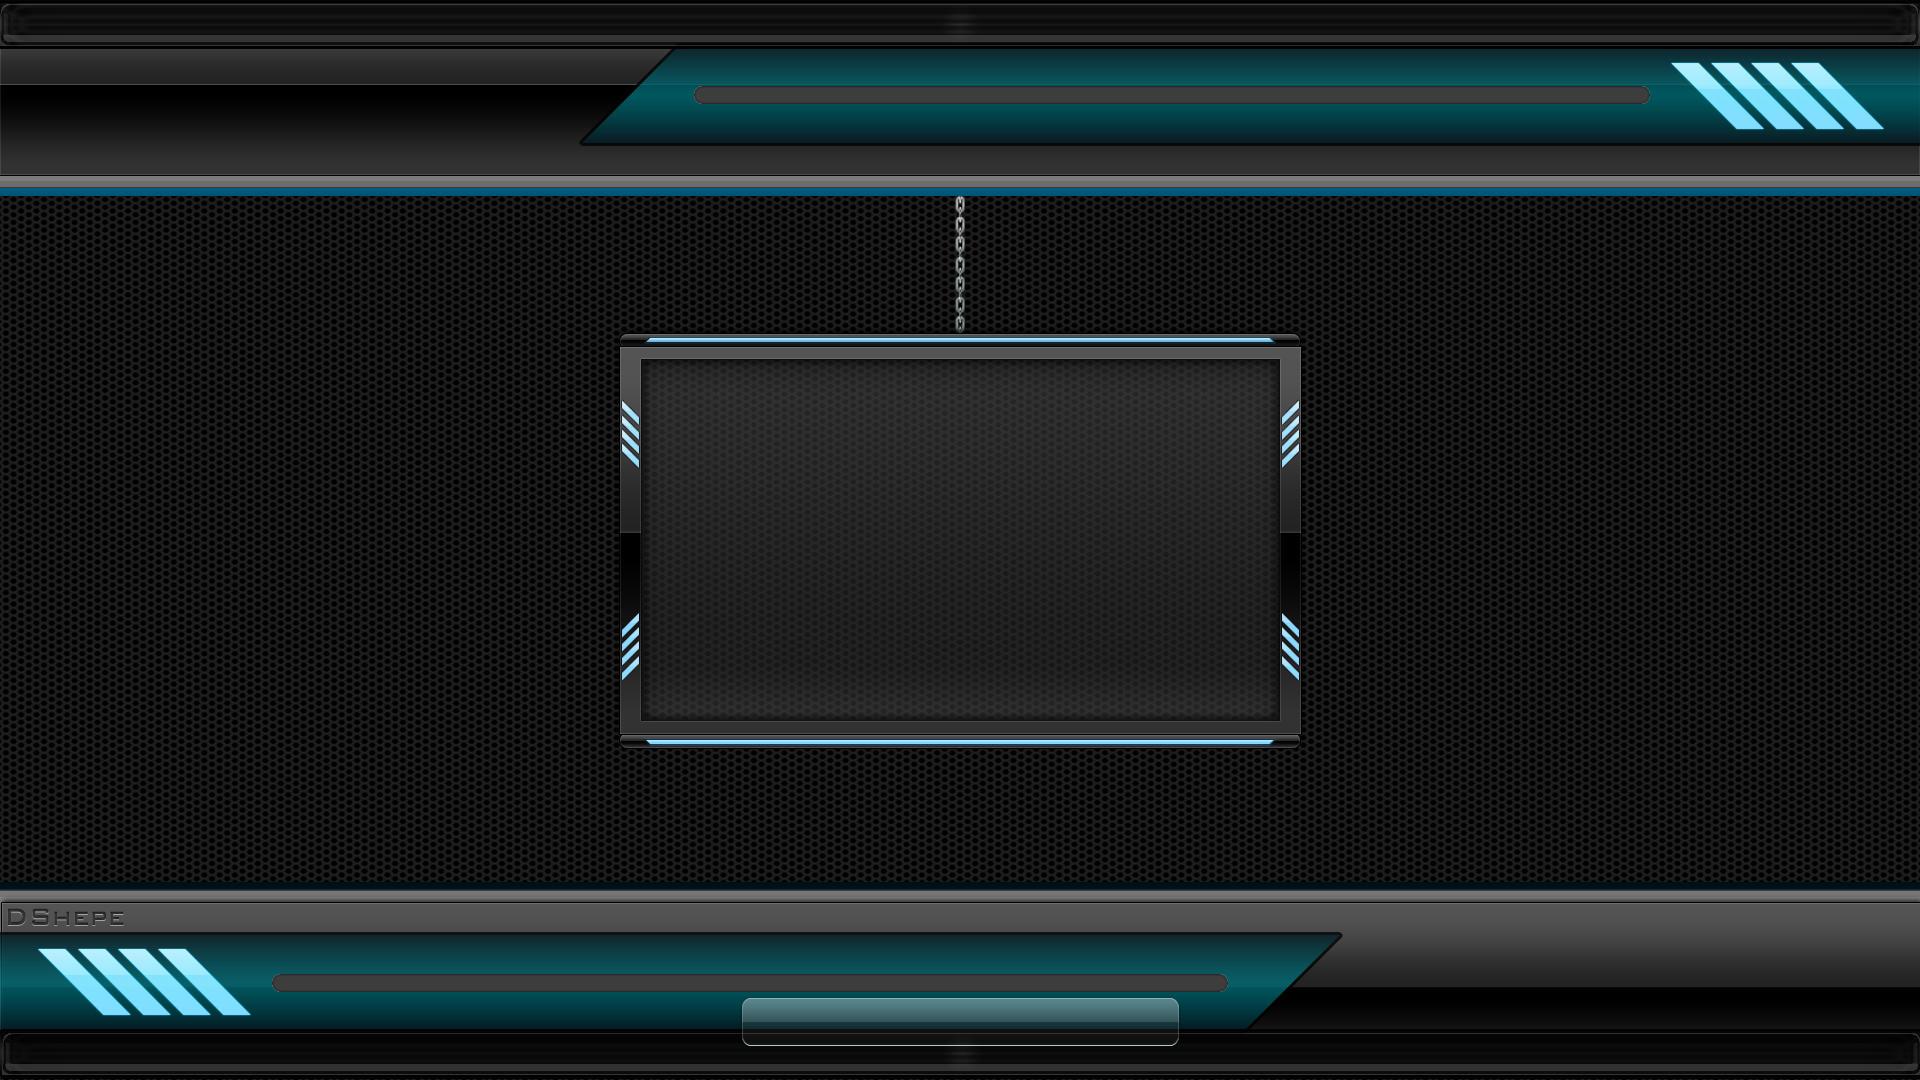 nova skins wallpaper mobile